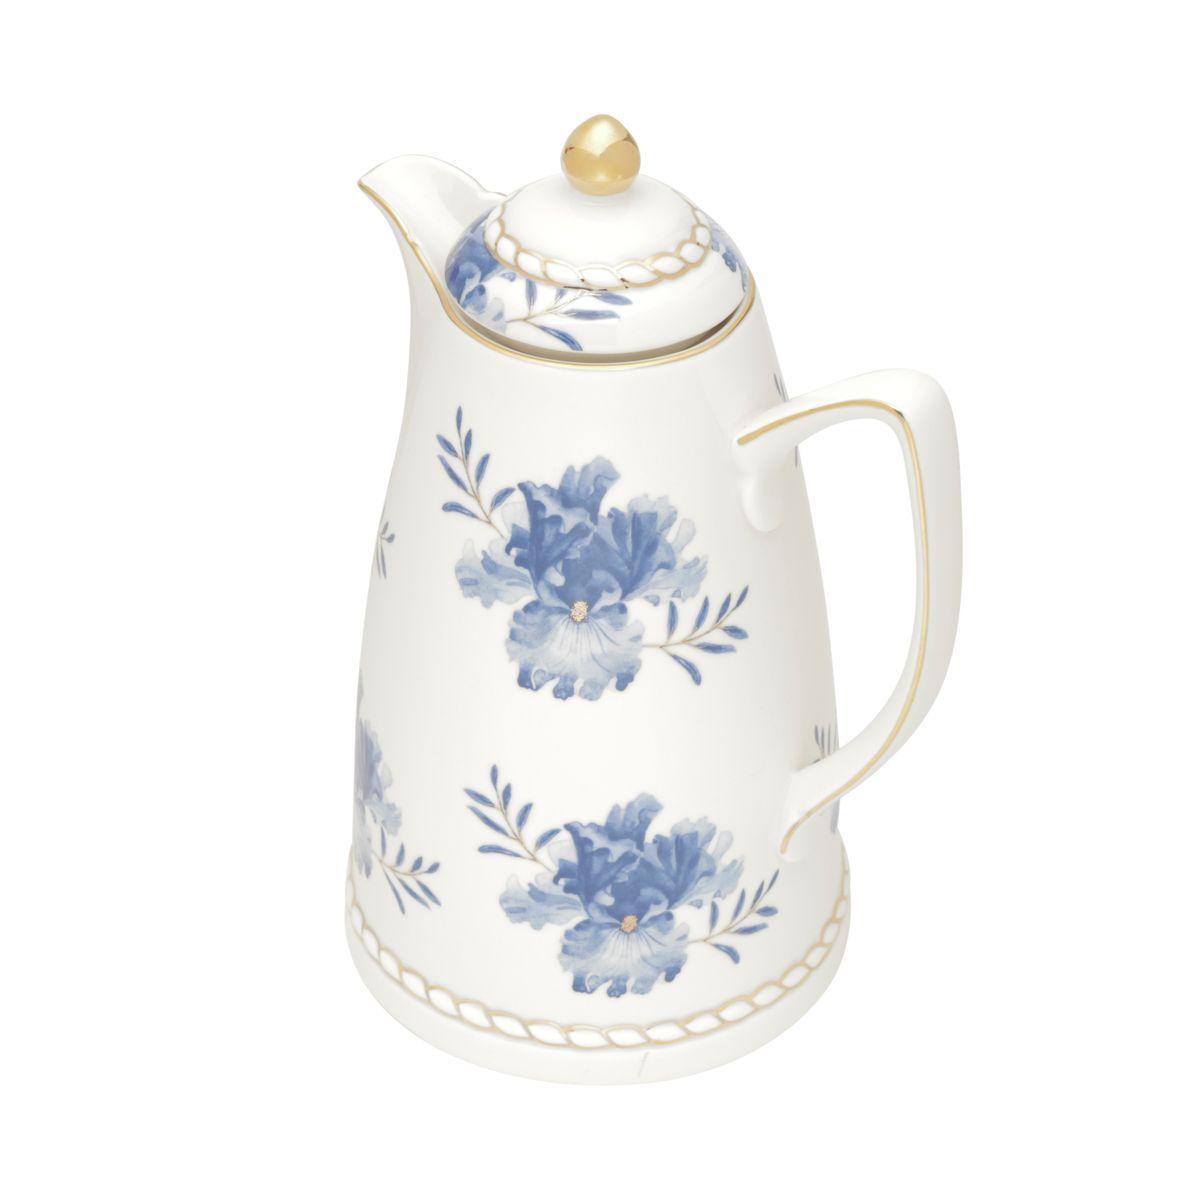 Garrafa Térmica 900ml para café ou chá de porcelana branca Floral Wolff - 35579